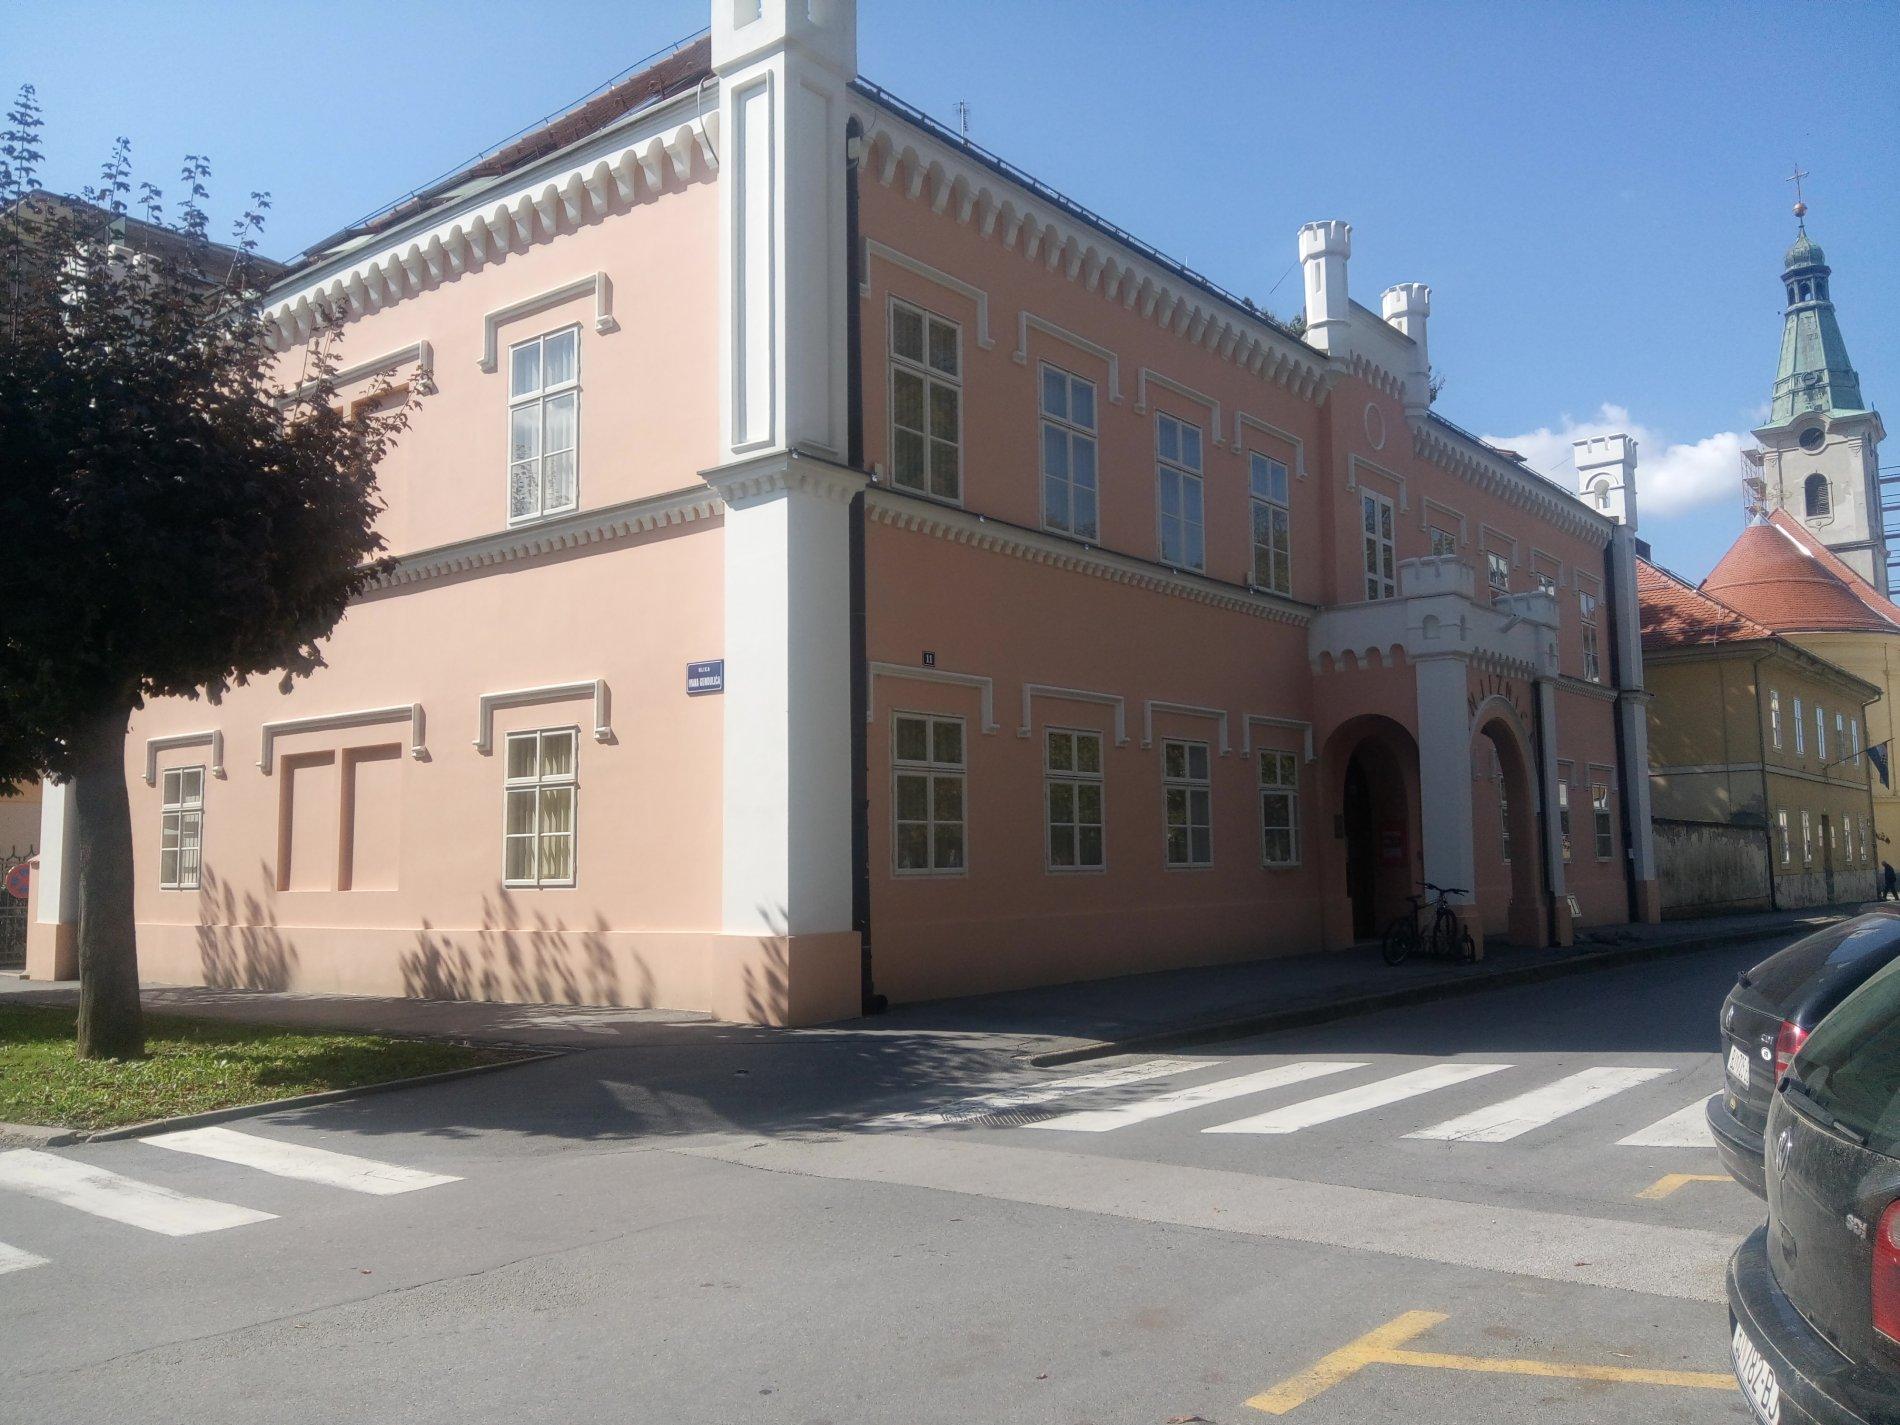 Poslovni prostori Grada Bjelovara - Trg Eugena Kvaternika 11